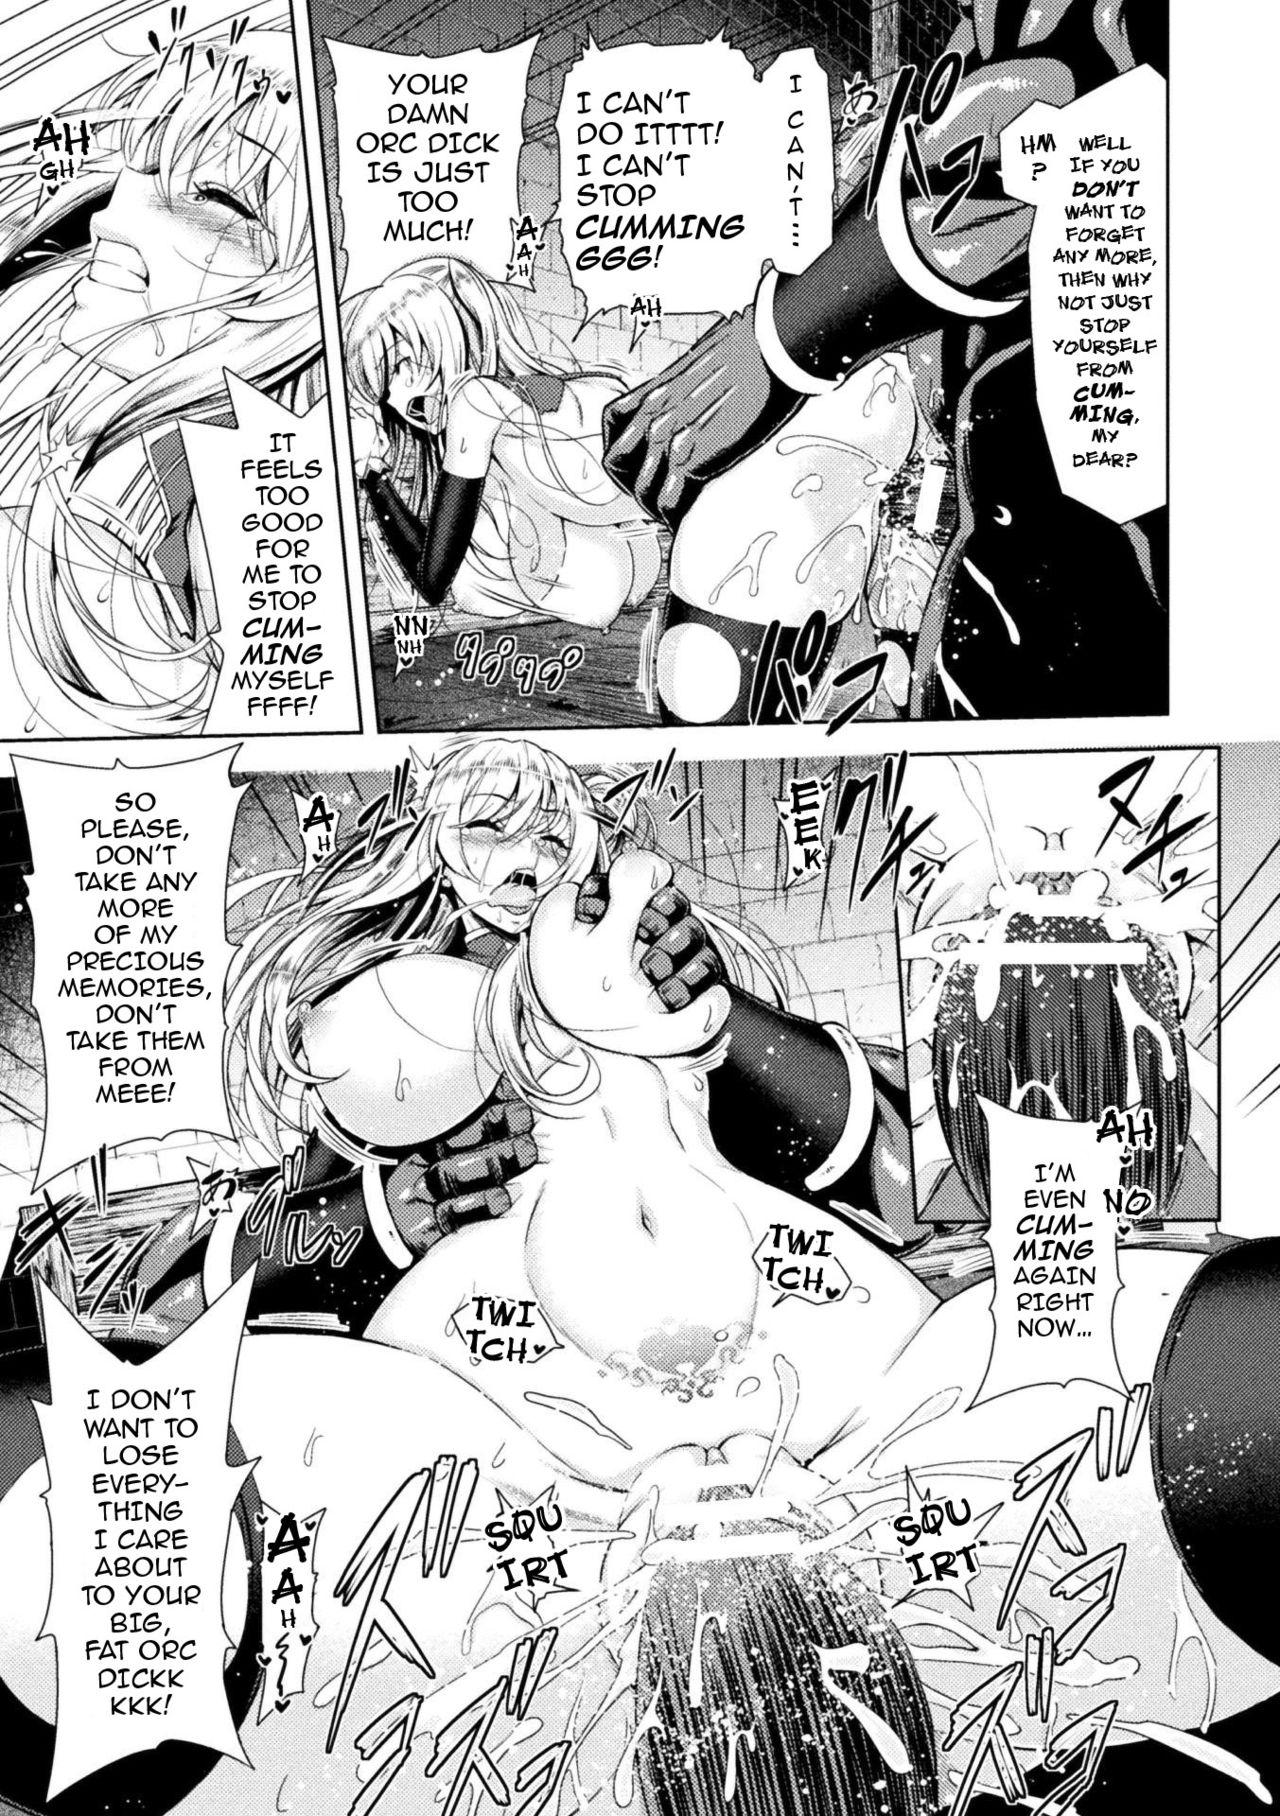 [Yamada Gogogo] Erona ~Orc no Inmon ni Okasareta Onna Kishi no Matsuro~   Erona ~The Fall of a Beautiful Knight Cursed with the Lewd Mark of an Orc~ Ch. 1-6 [English] {darknight} 45